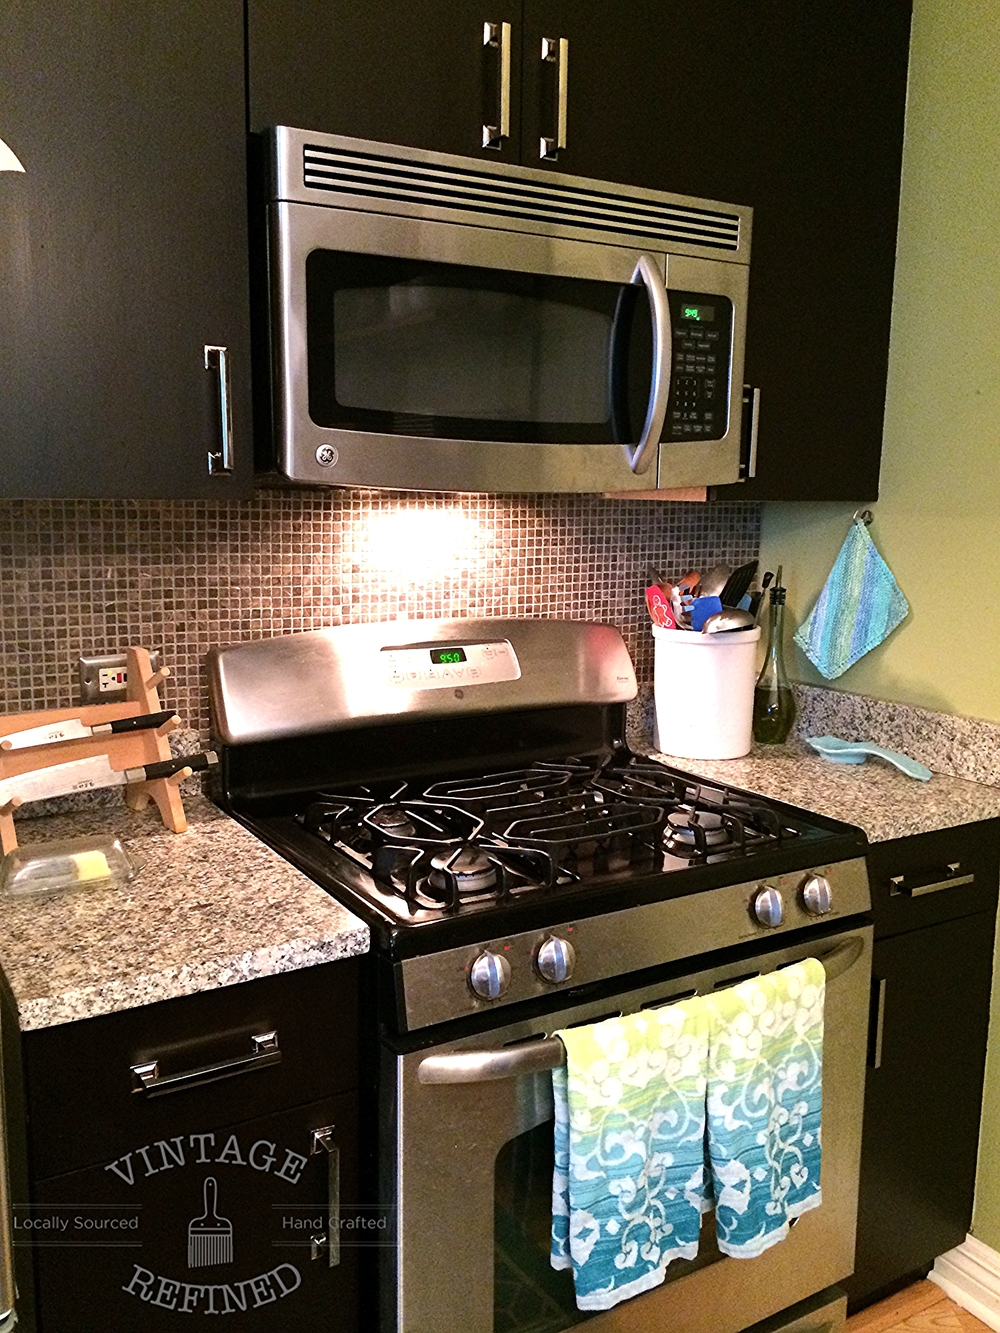 vintage refined gel staining kitchen cabinets